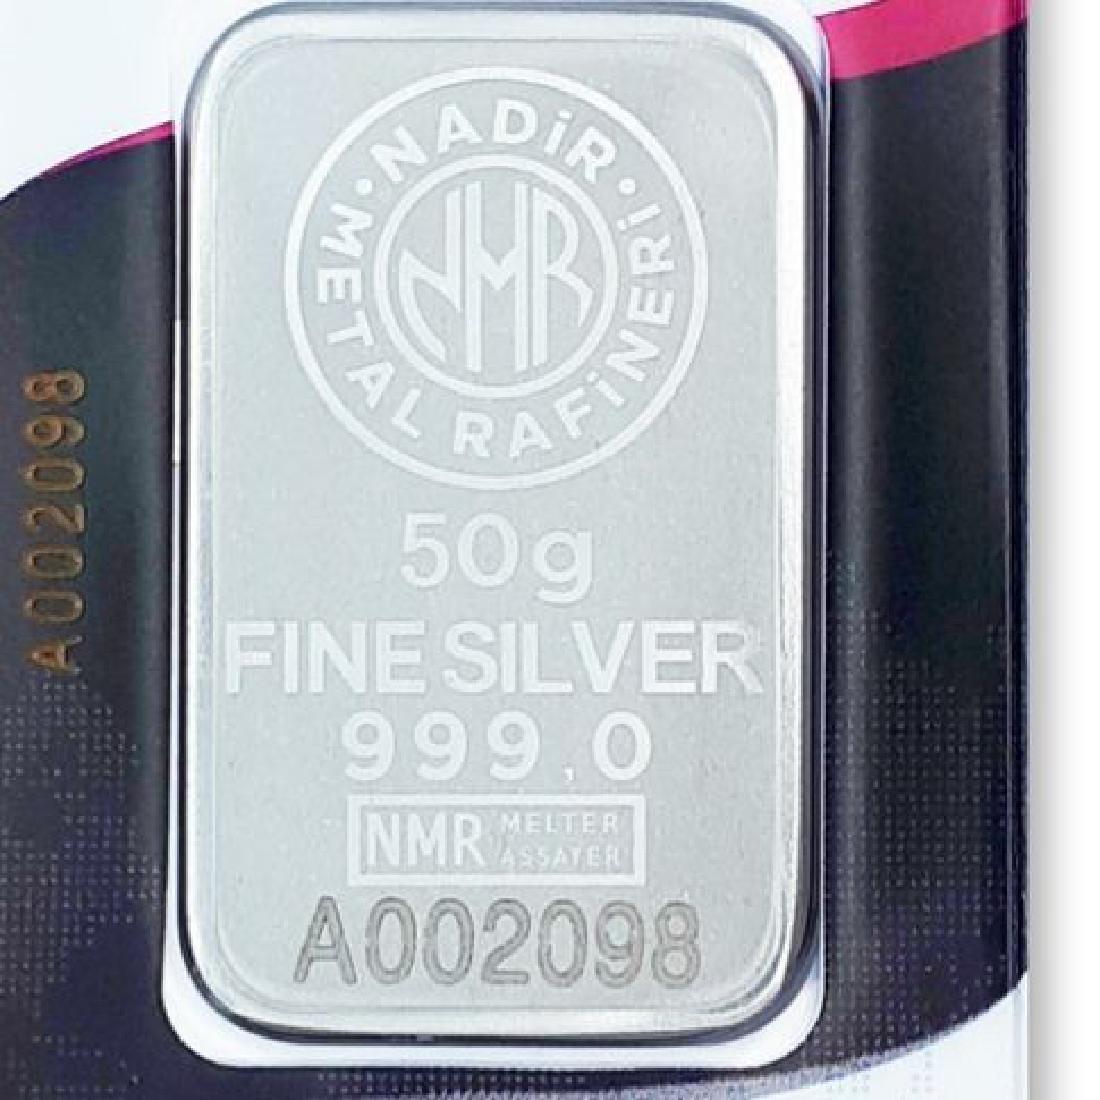 50 gr. - 999/1000 - Minted/ Sealed Silver bar